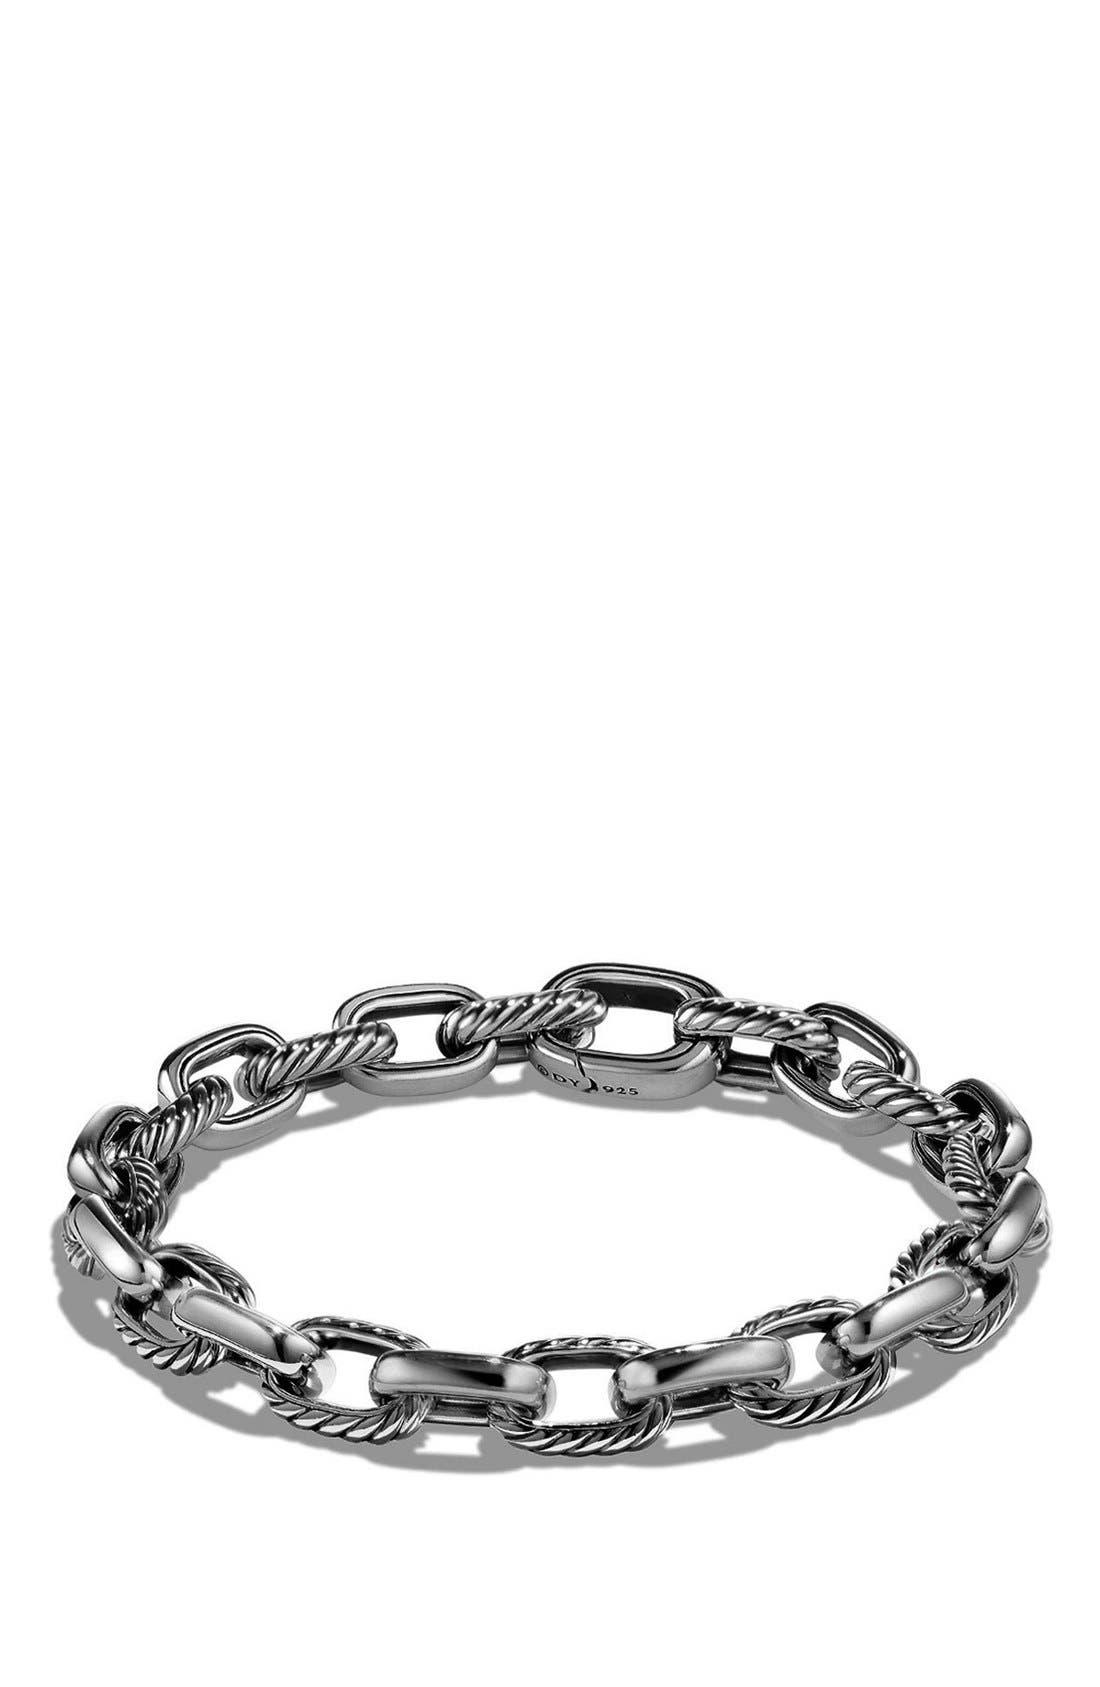 Alternate Image 1 Selected - David Yurman 'Cable Classics' Oval Link Bracelet